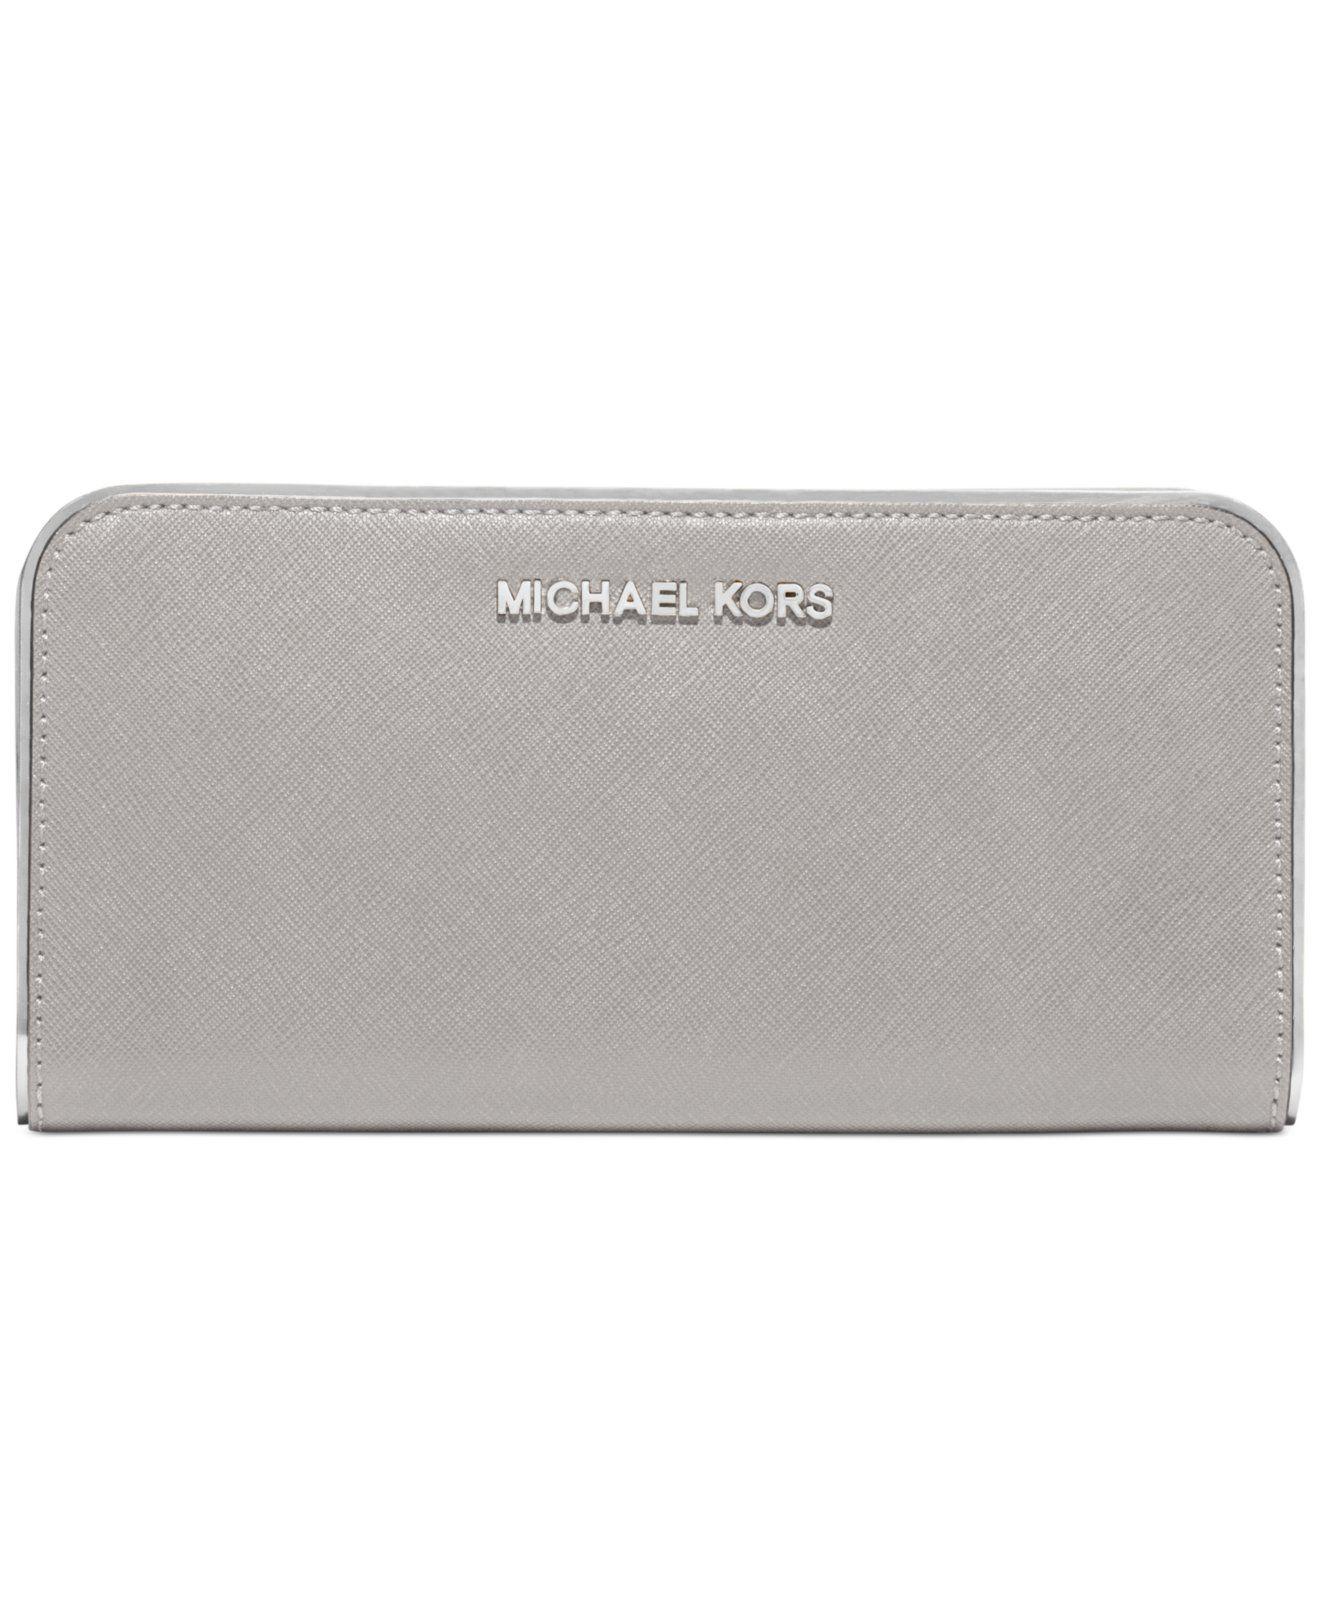 a2b440e51c50 MICHAEL Michael Kors Specchio Jet Set Travel Zip Around Continental Wallet  148 reg